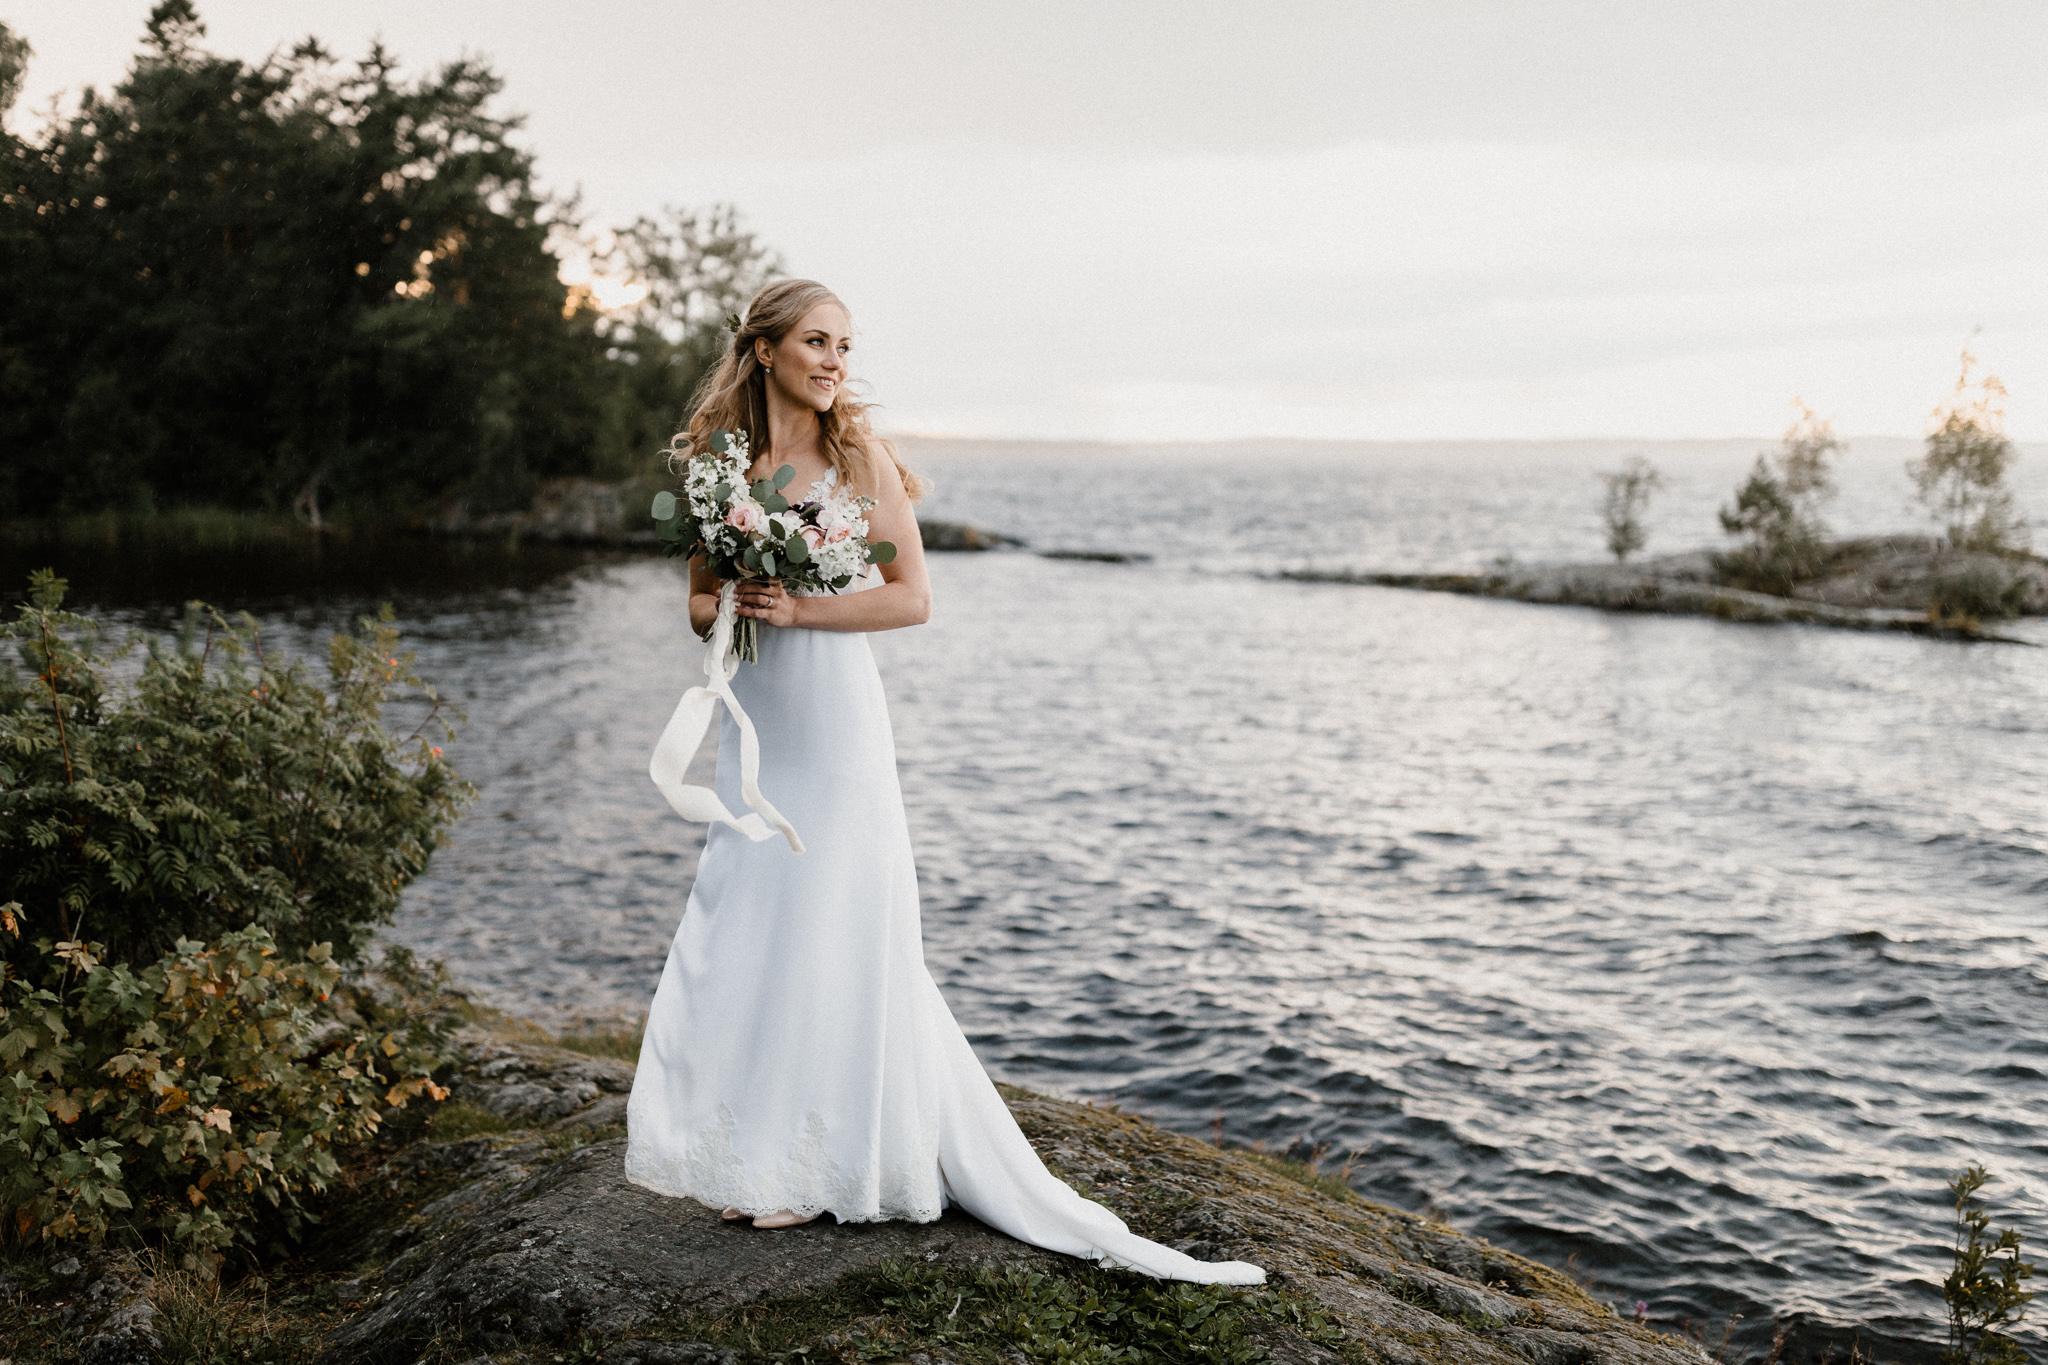 Johanna + Mikko - Tampere - Photo by Patrick Karkkolainen Wedding Photographer-159.jpg